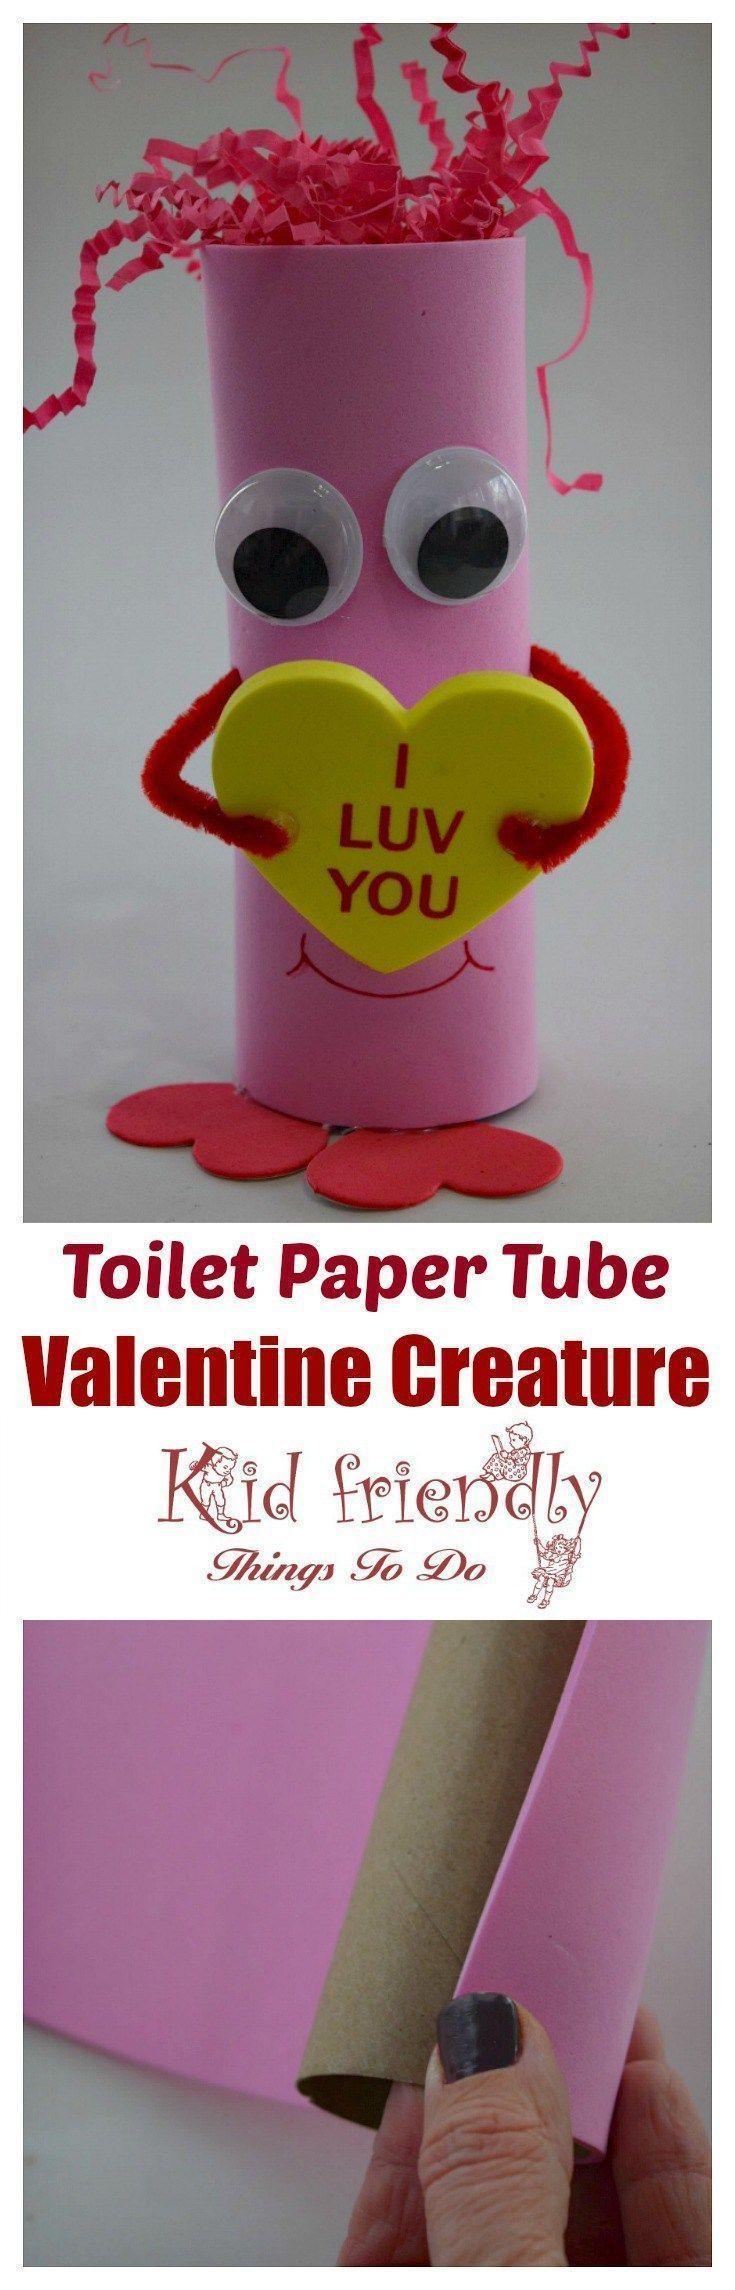 Easy Valentine Creature Craft for Kids to Make Preschool